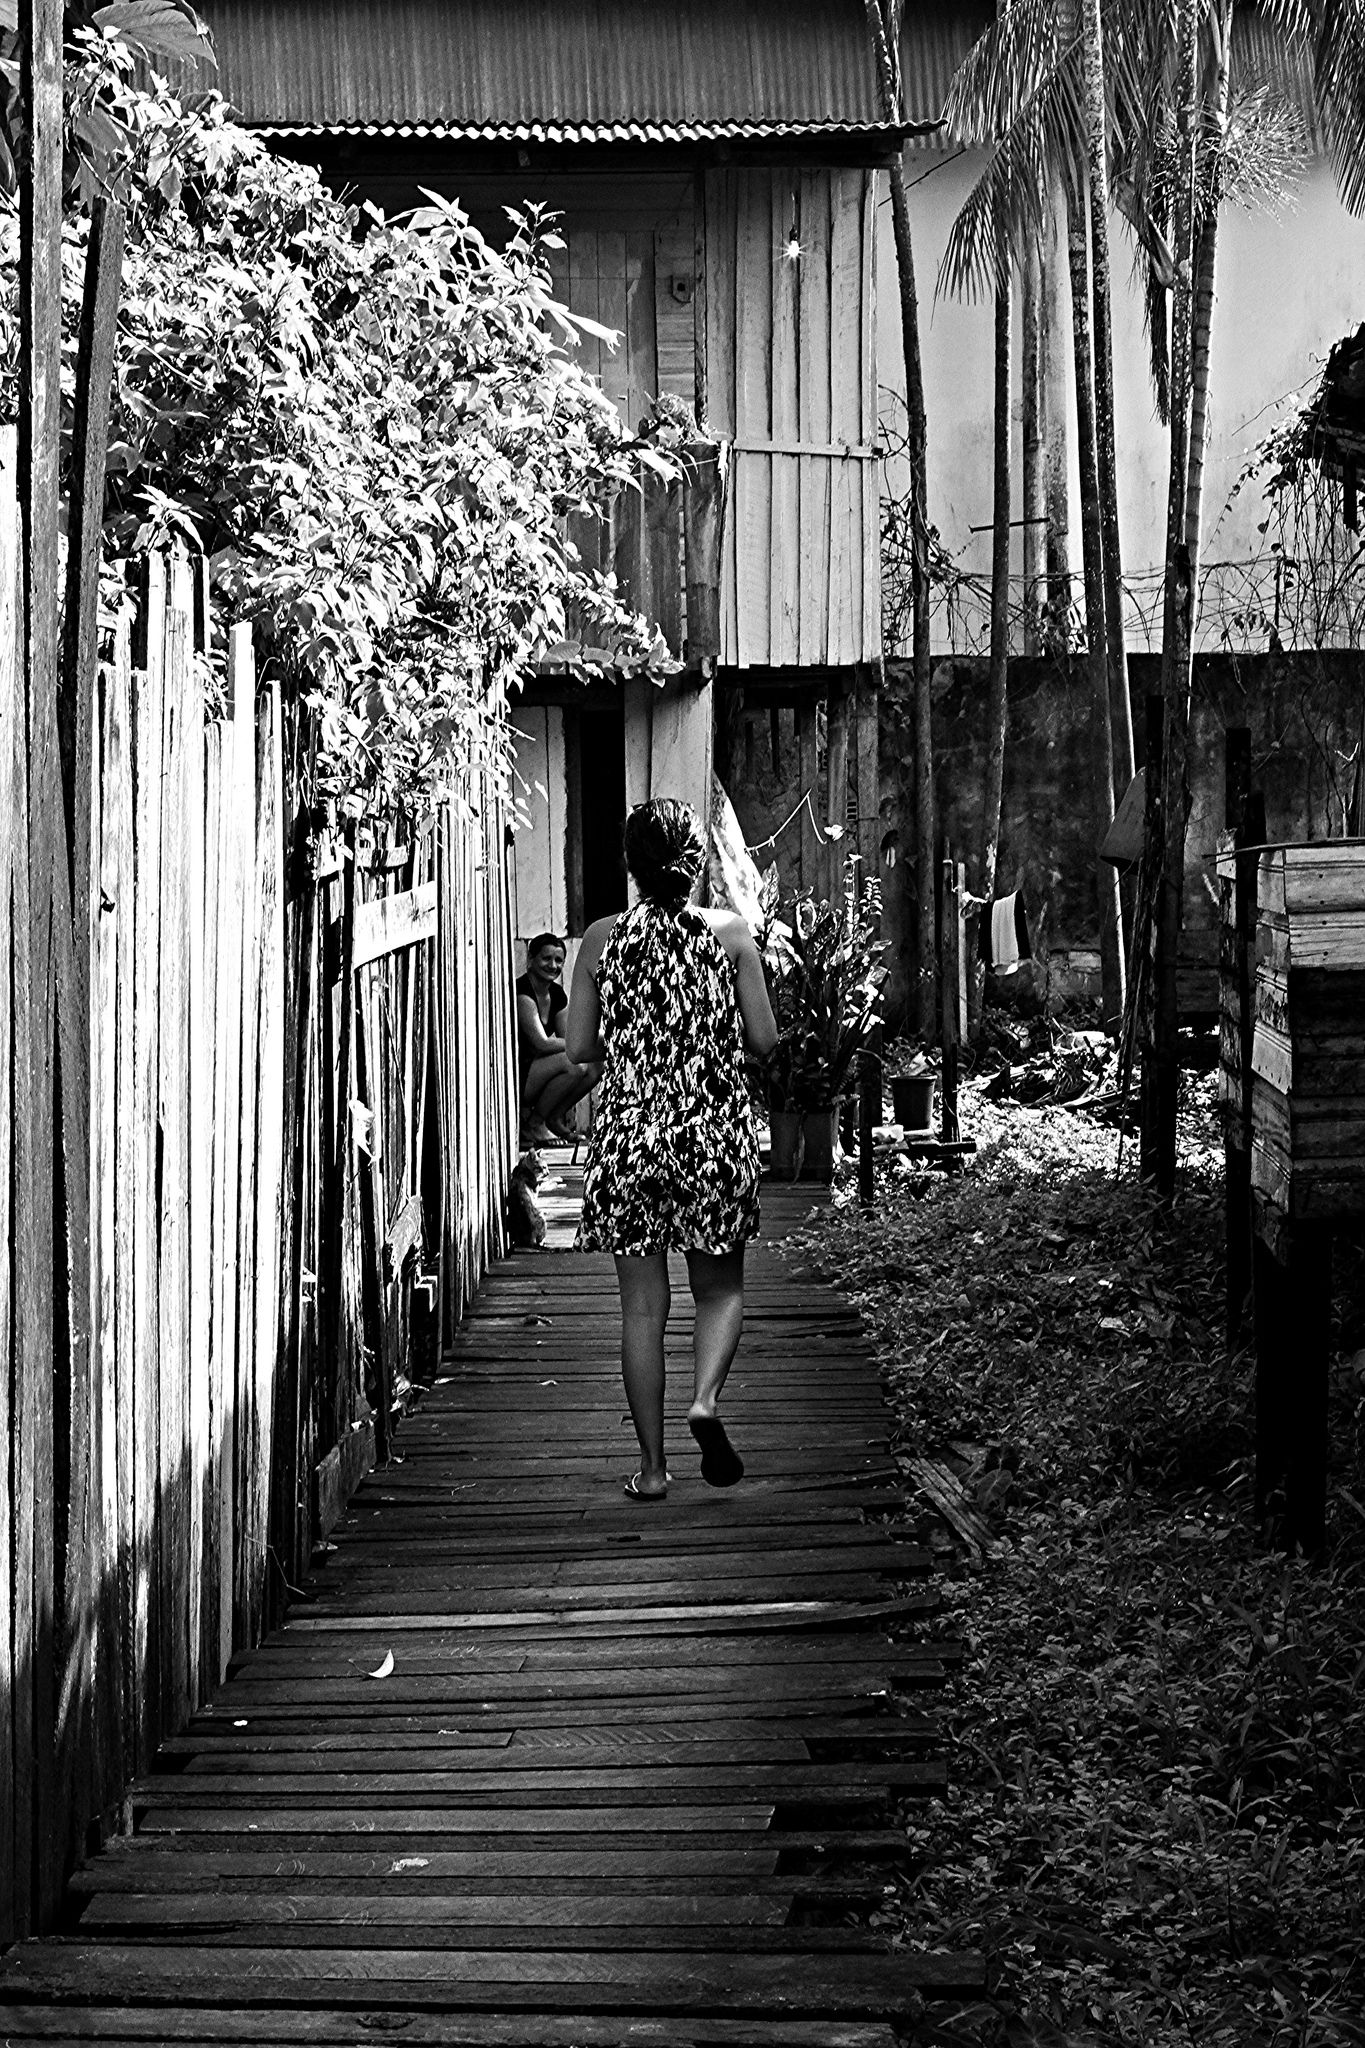 https://flic.kr/p/vt5xVs | Street Photography. Barca Village. Vila da Barca. Fotografia de Rua. Photographer: Luxã Nautilho. Belém, Pará, Brasil | Street Photography. Barca Village. Vila da Barca. Fotografia de Rua. Photographer: Luxã Nautilho. Belém, Pará, Brasil